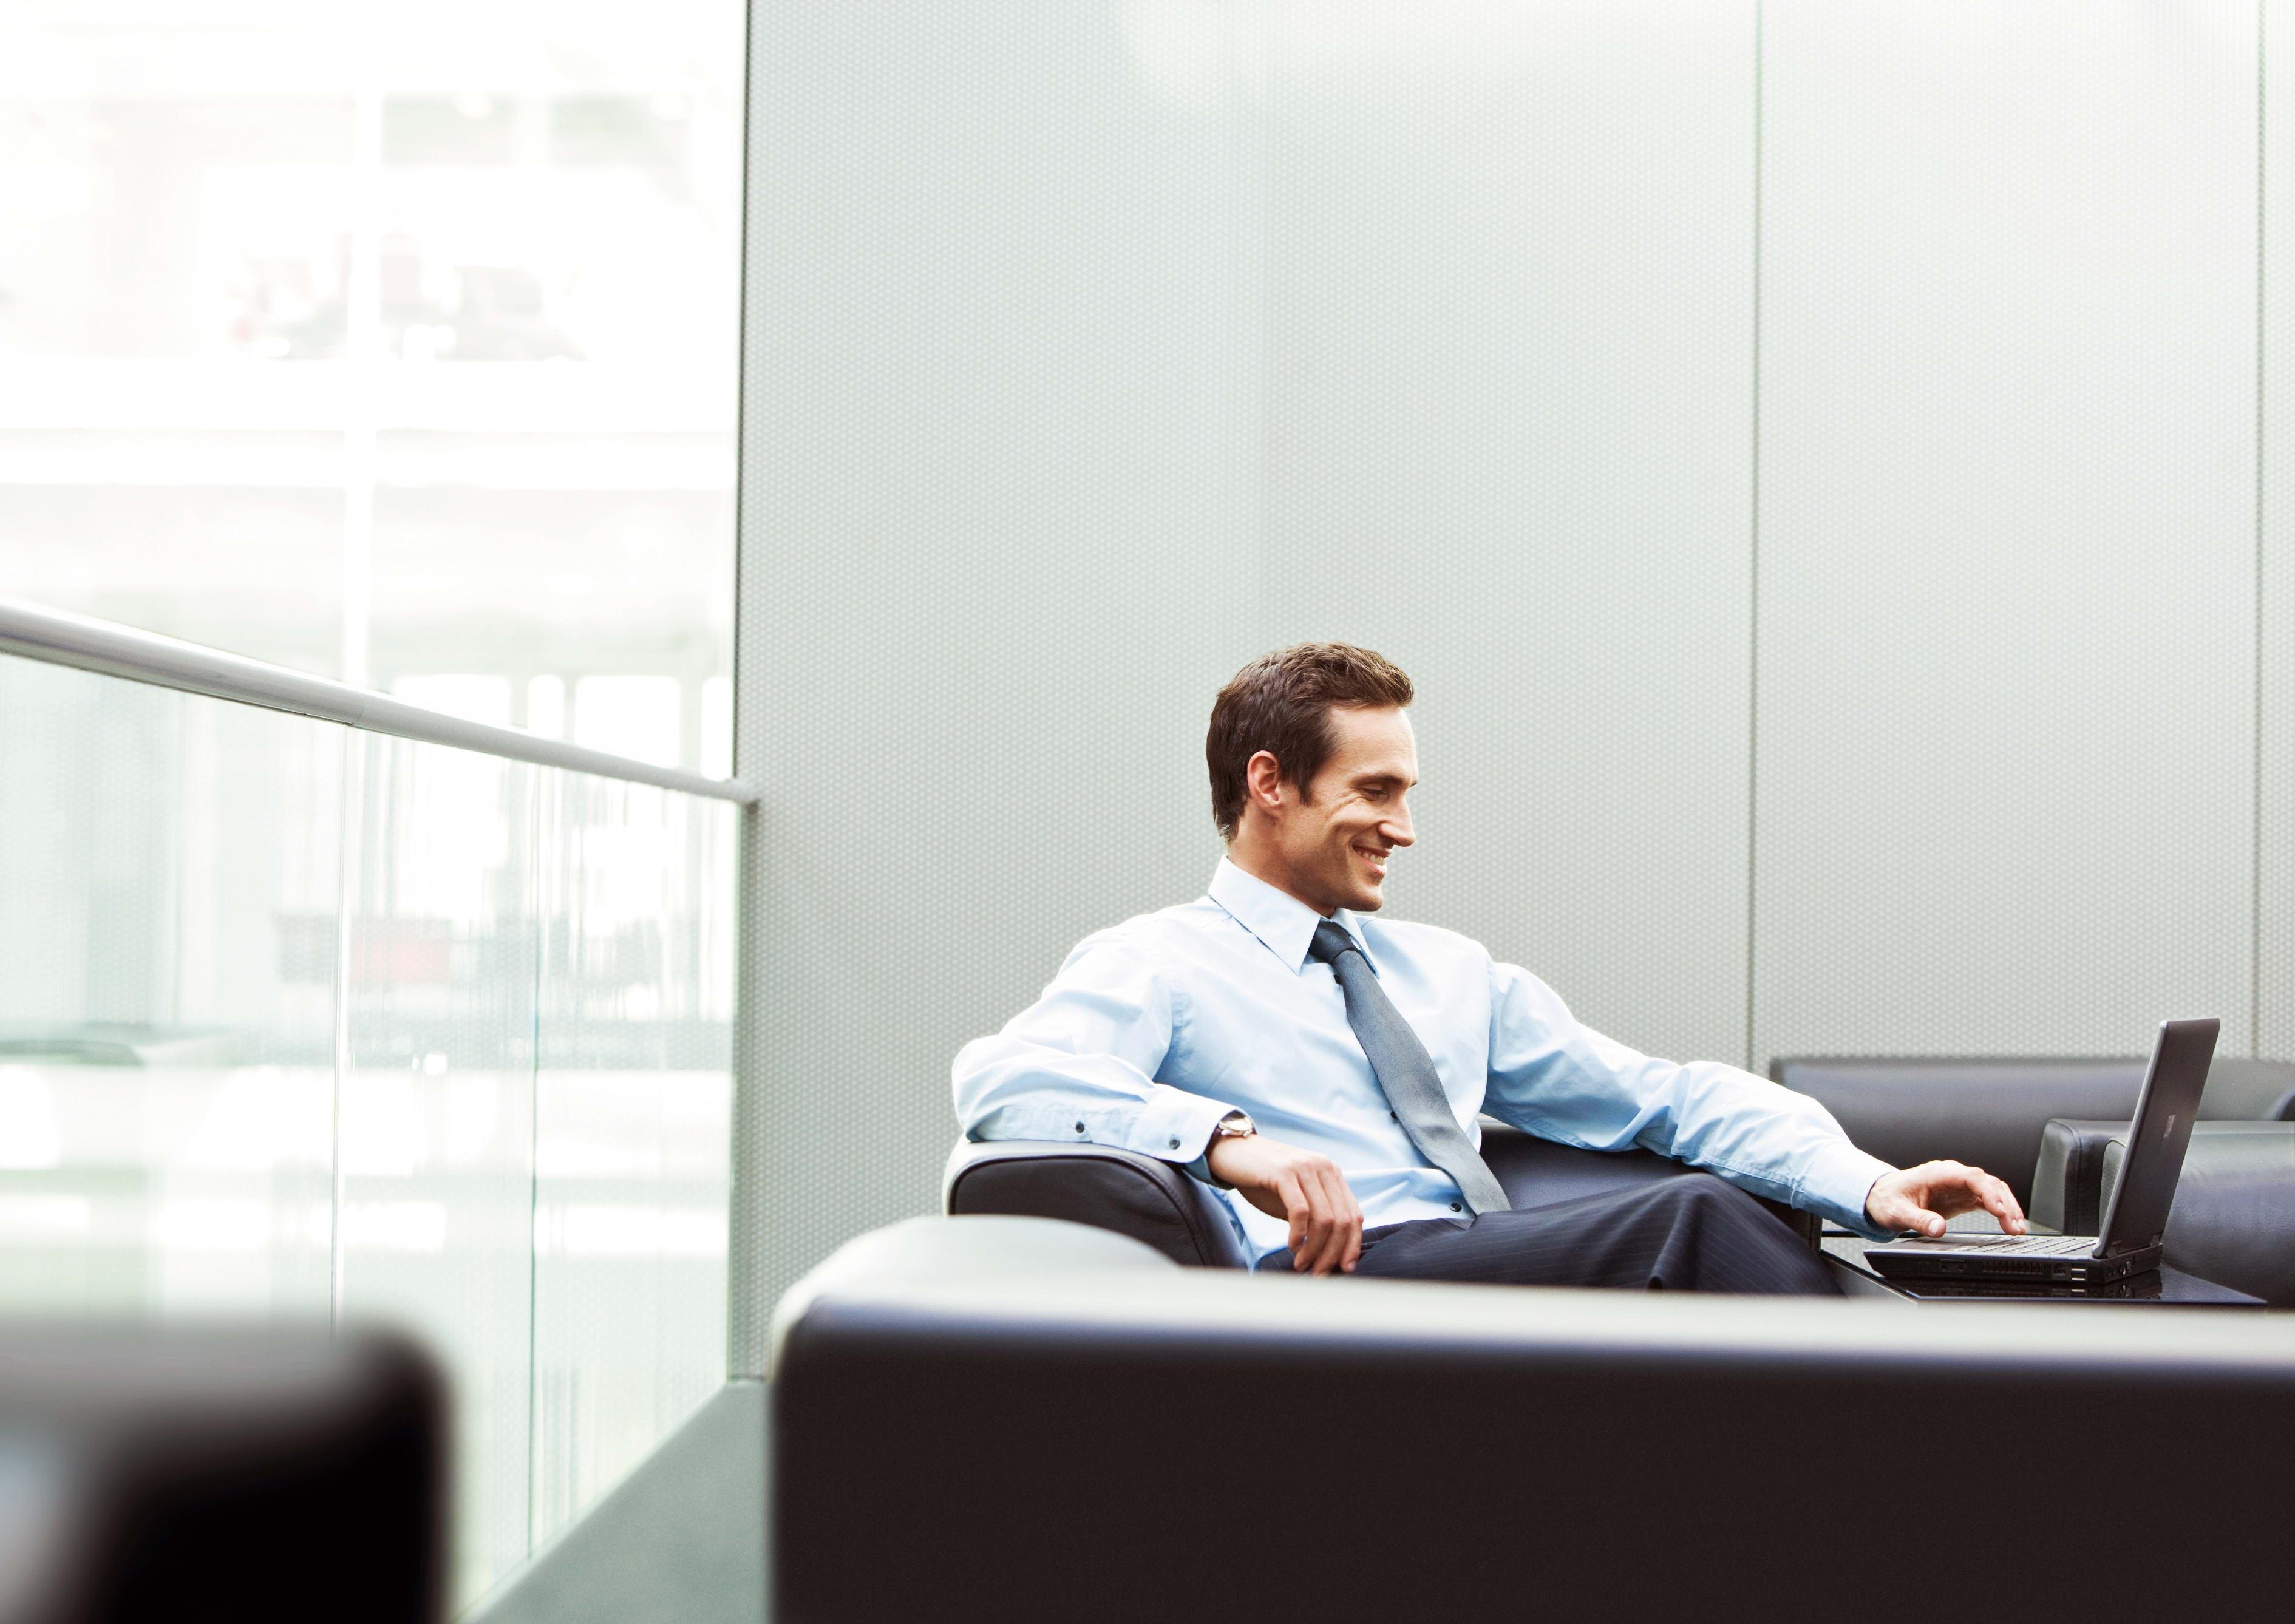 Wallpaper Sitting Office Laptop Person Smile Man